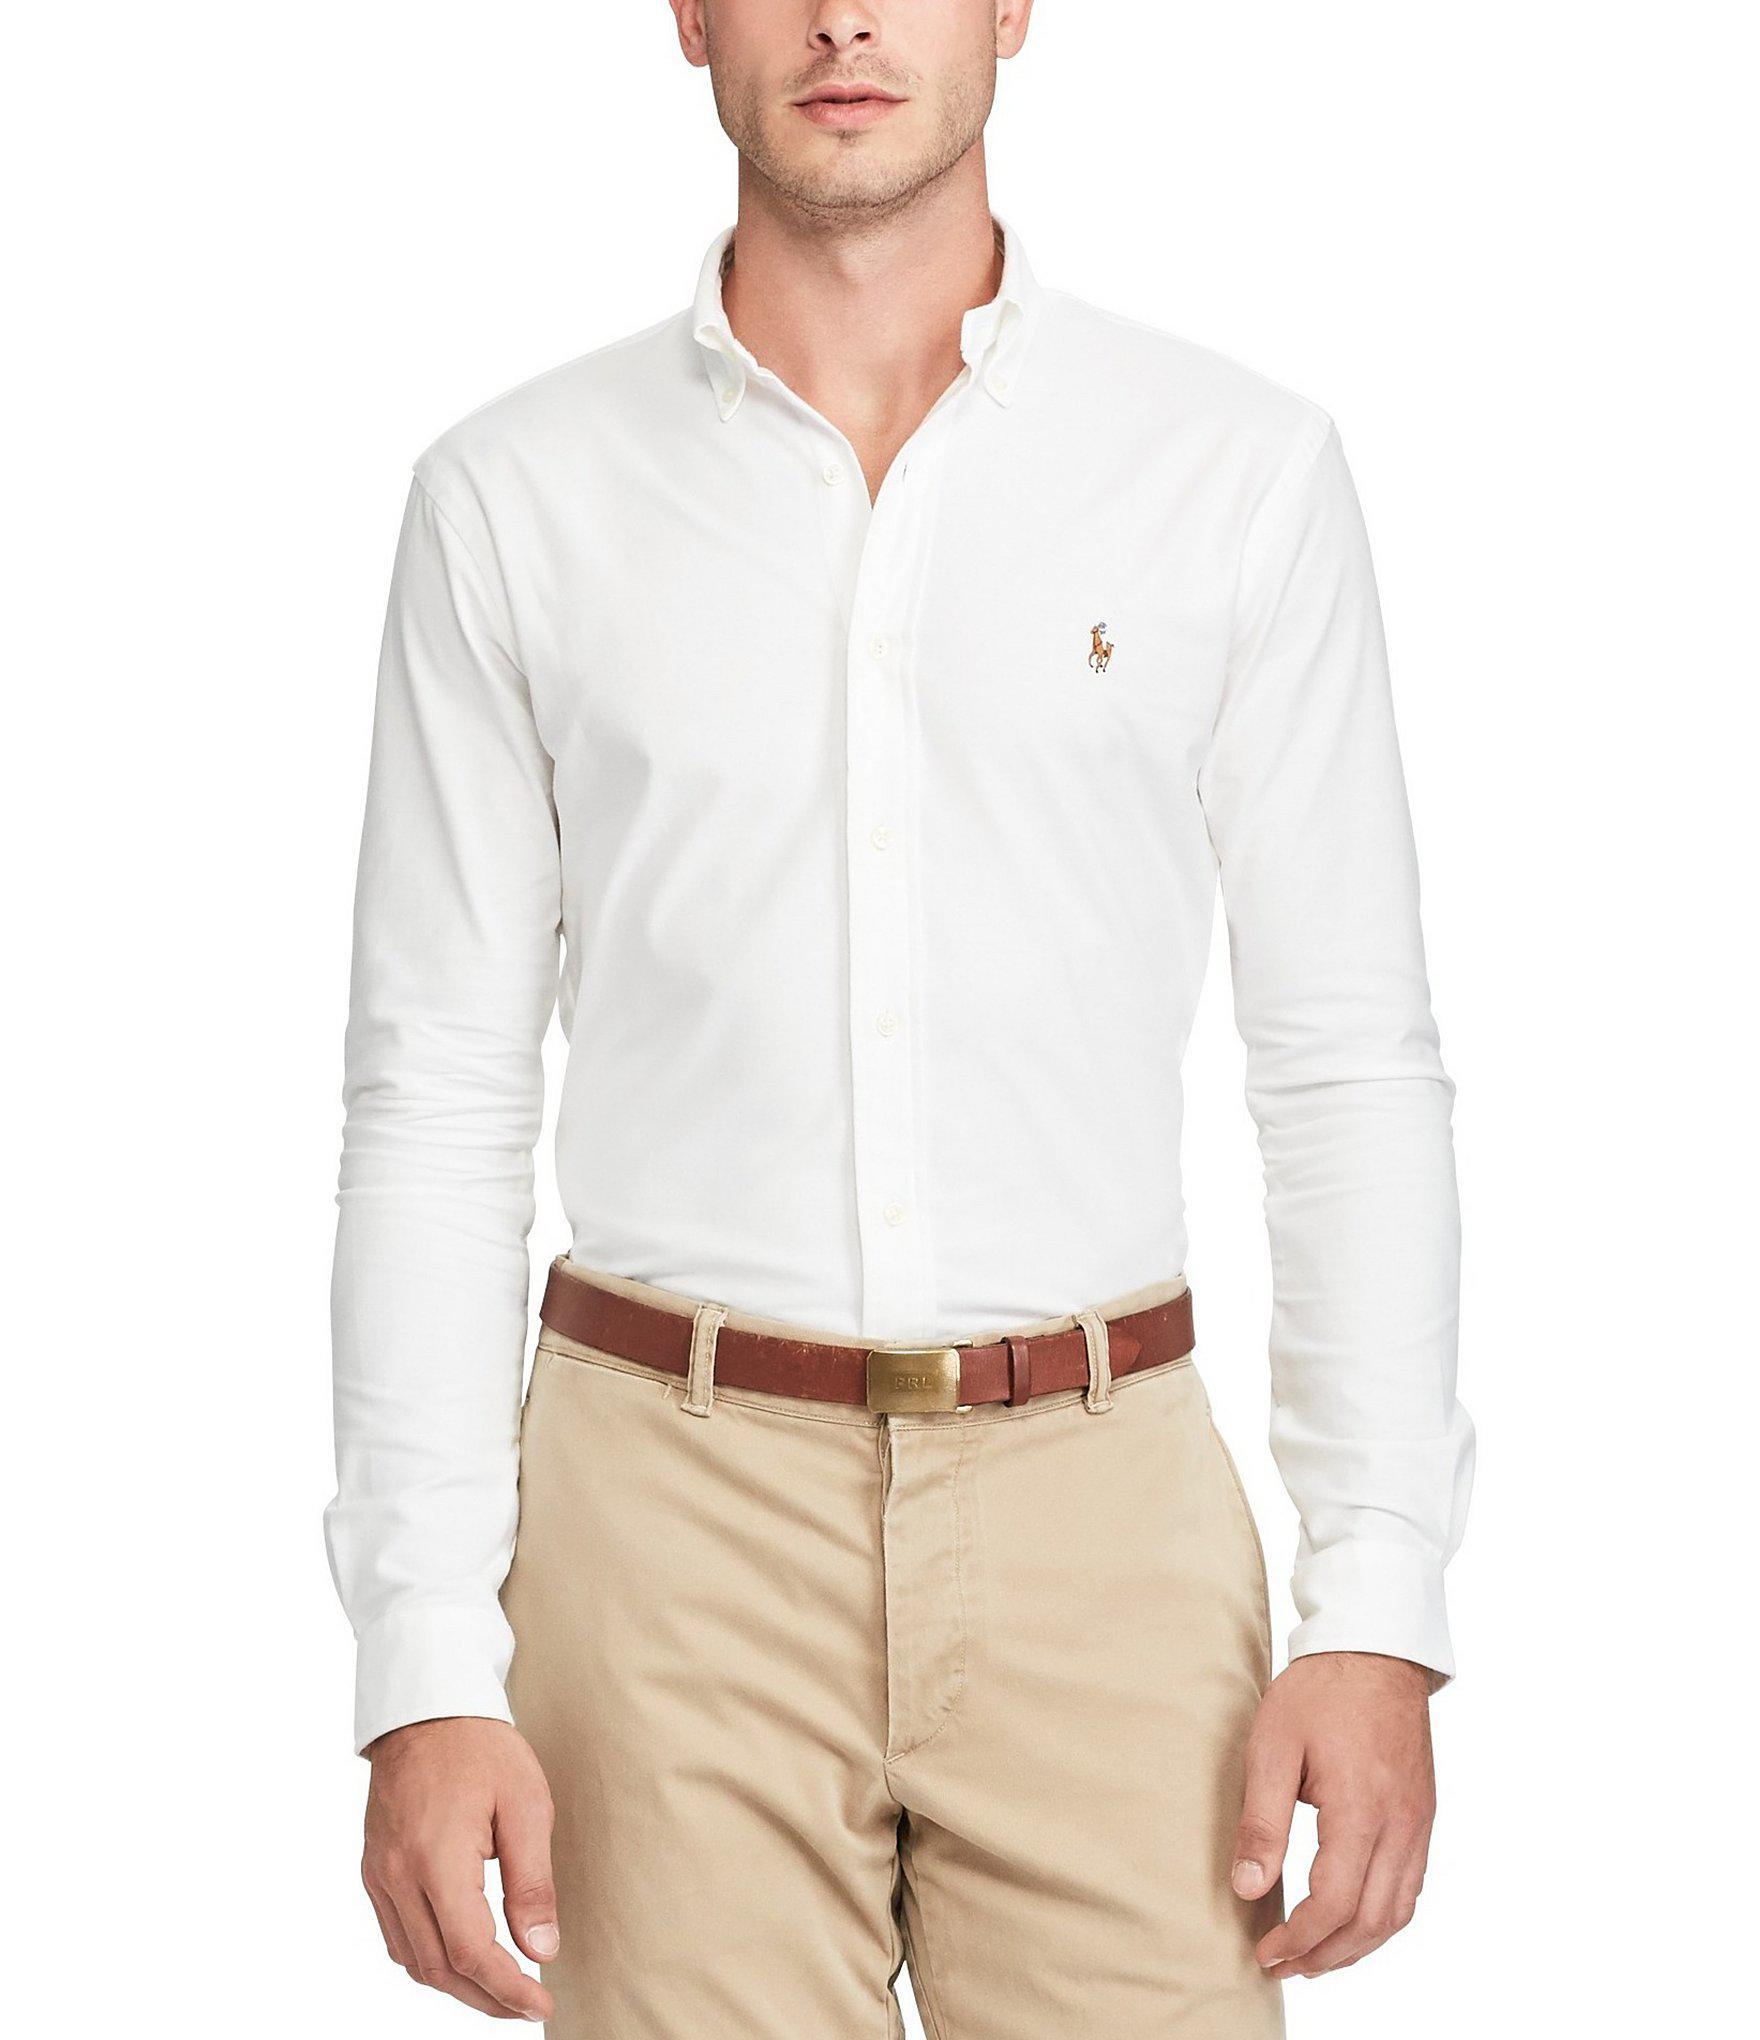 f488c3b2 Polo Ralph Lauren. Men's Blue Slim-fit Solid Stretch Oxford Long-sleeve  Woven Shirt